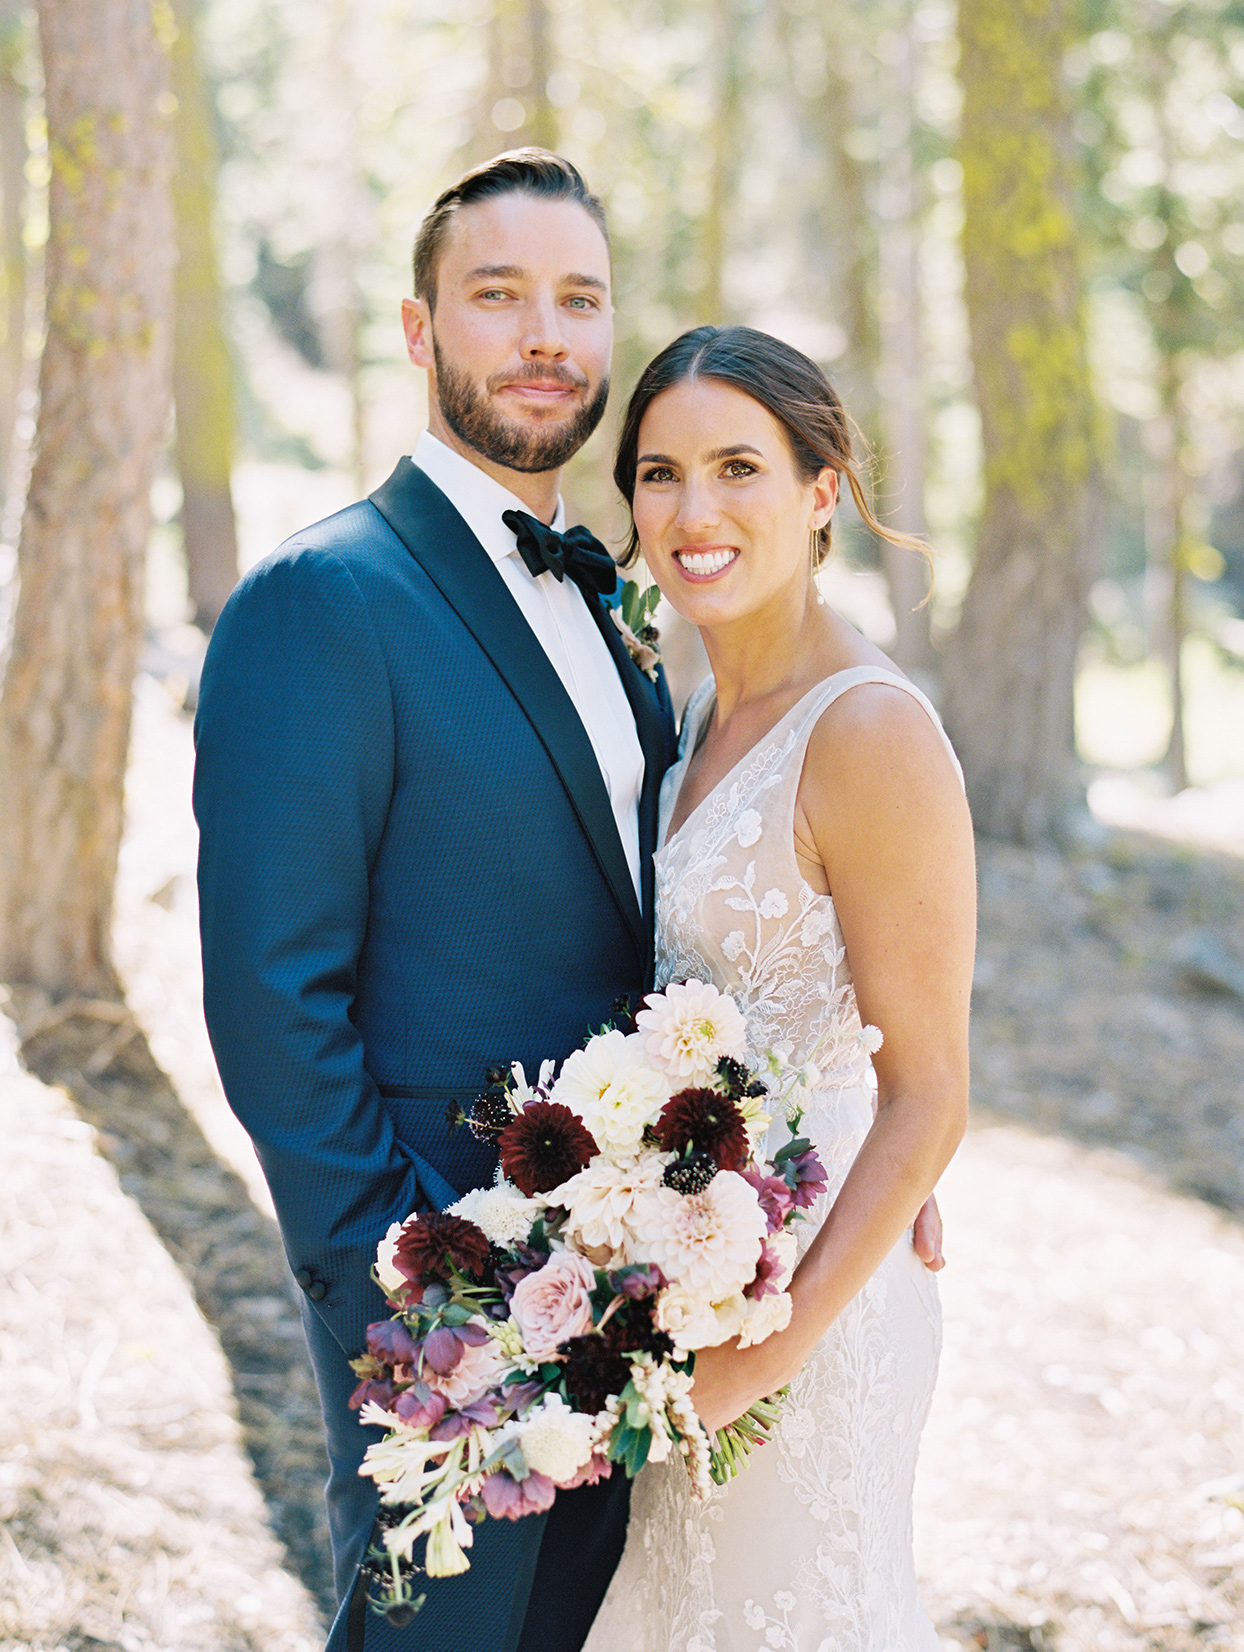 wedding couple portrait outdoors with lush bouquet